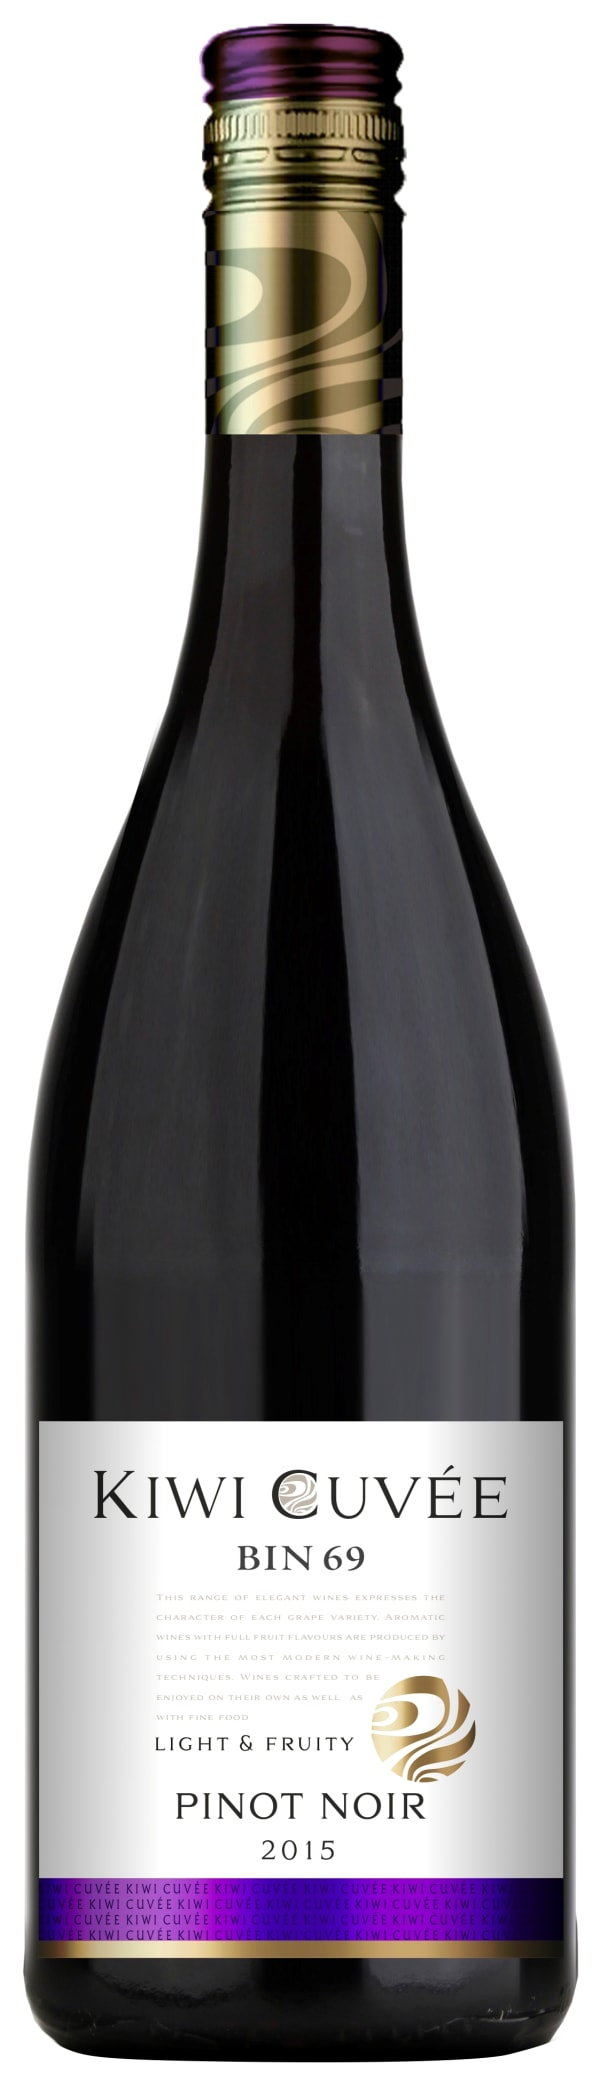 Kiwi Cuvée Bin 69 Pinot Noir 2018